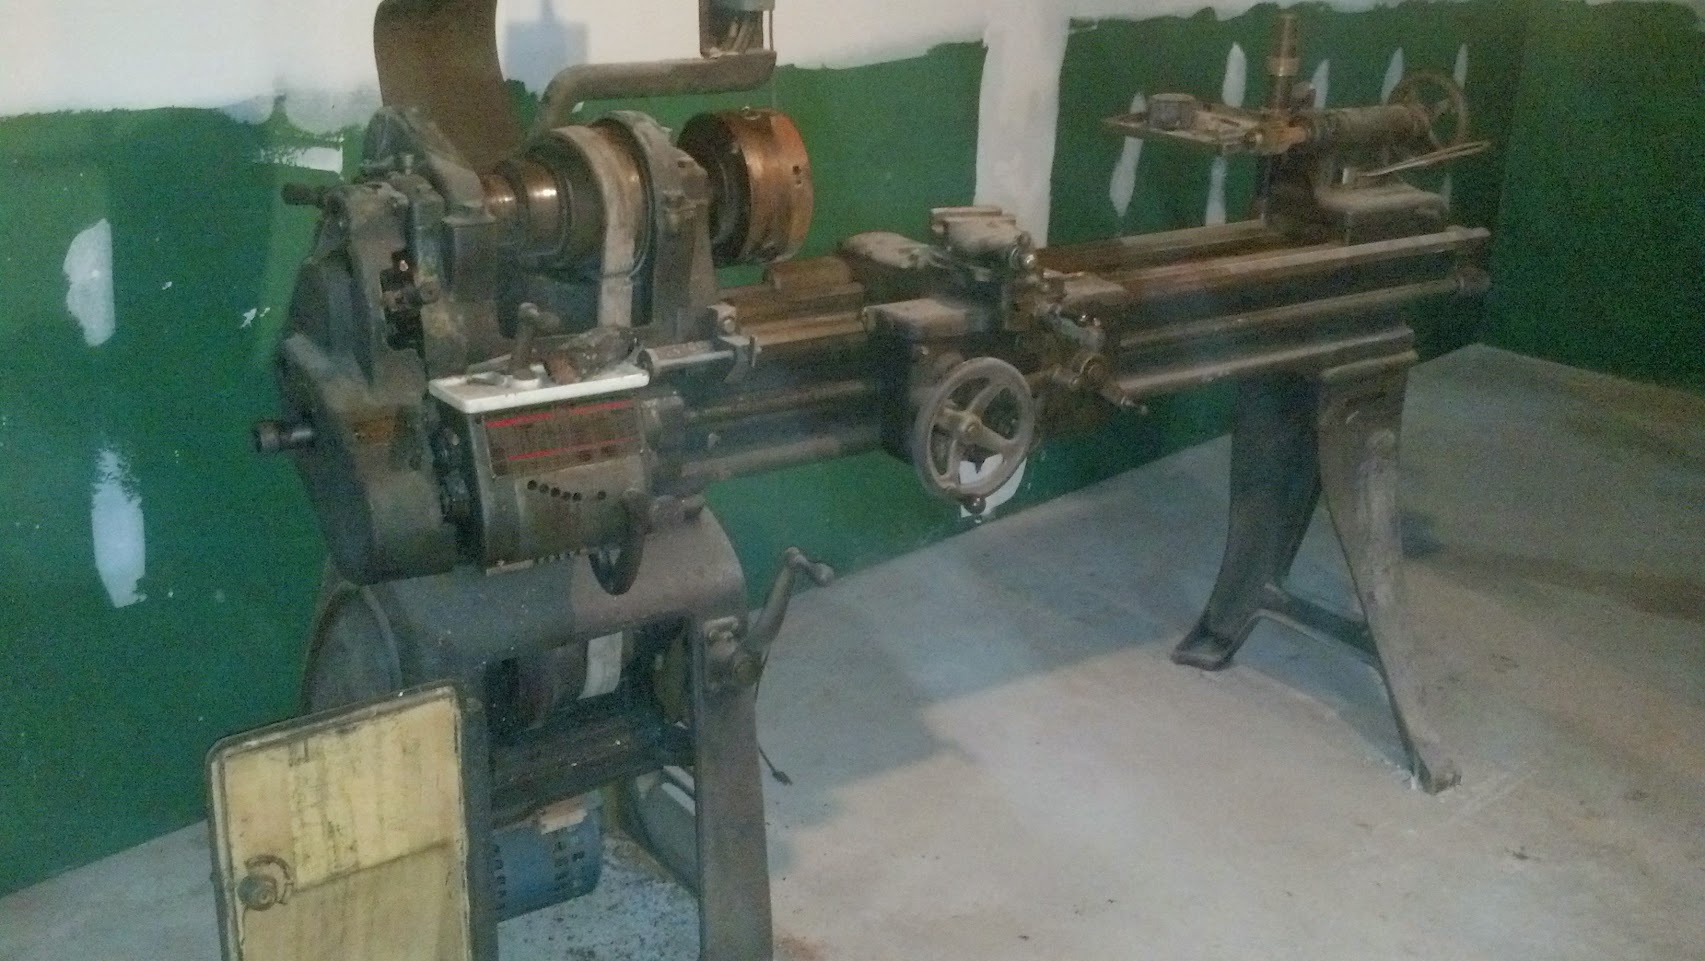 Lathe Mill Drillpress Machine Purchasing Question Archive 240v 3 Phase Wiring Diagram Http Wwwpracticalmachinistcom Vb South Alloyavenue Network